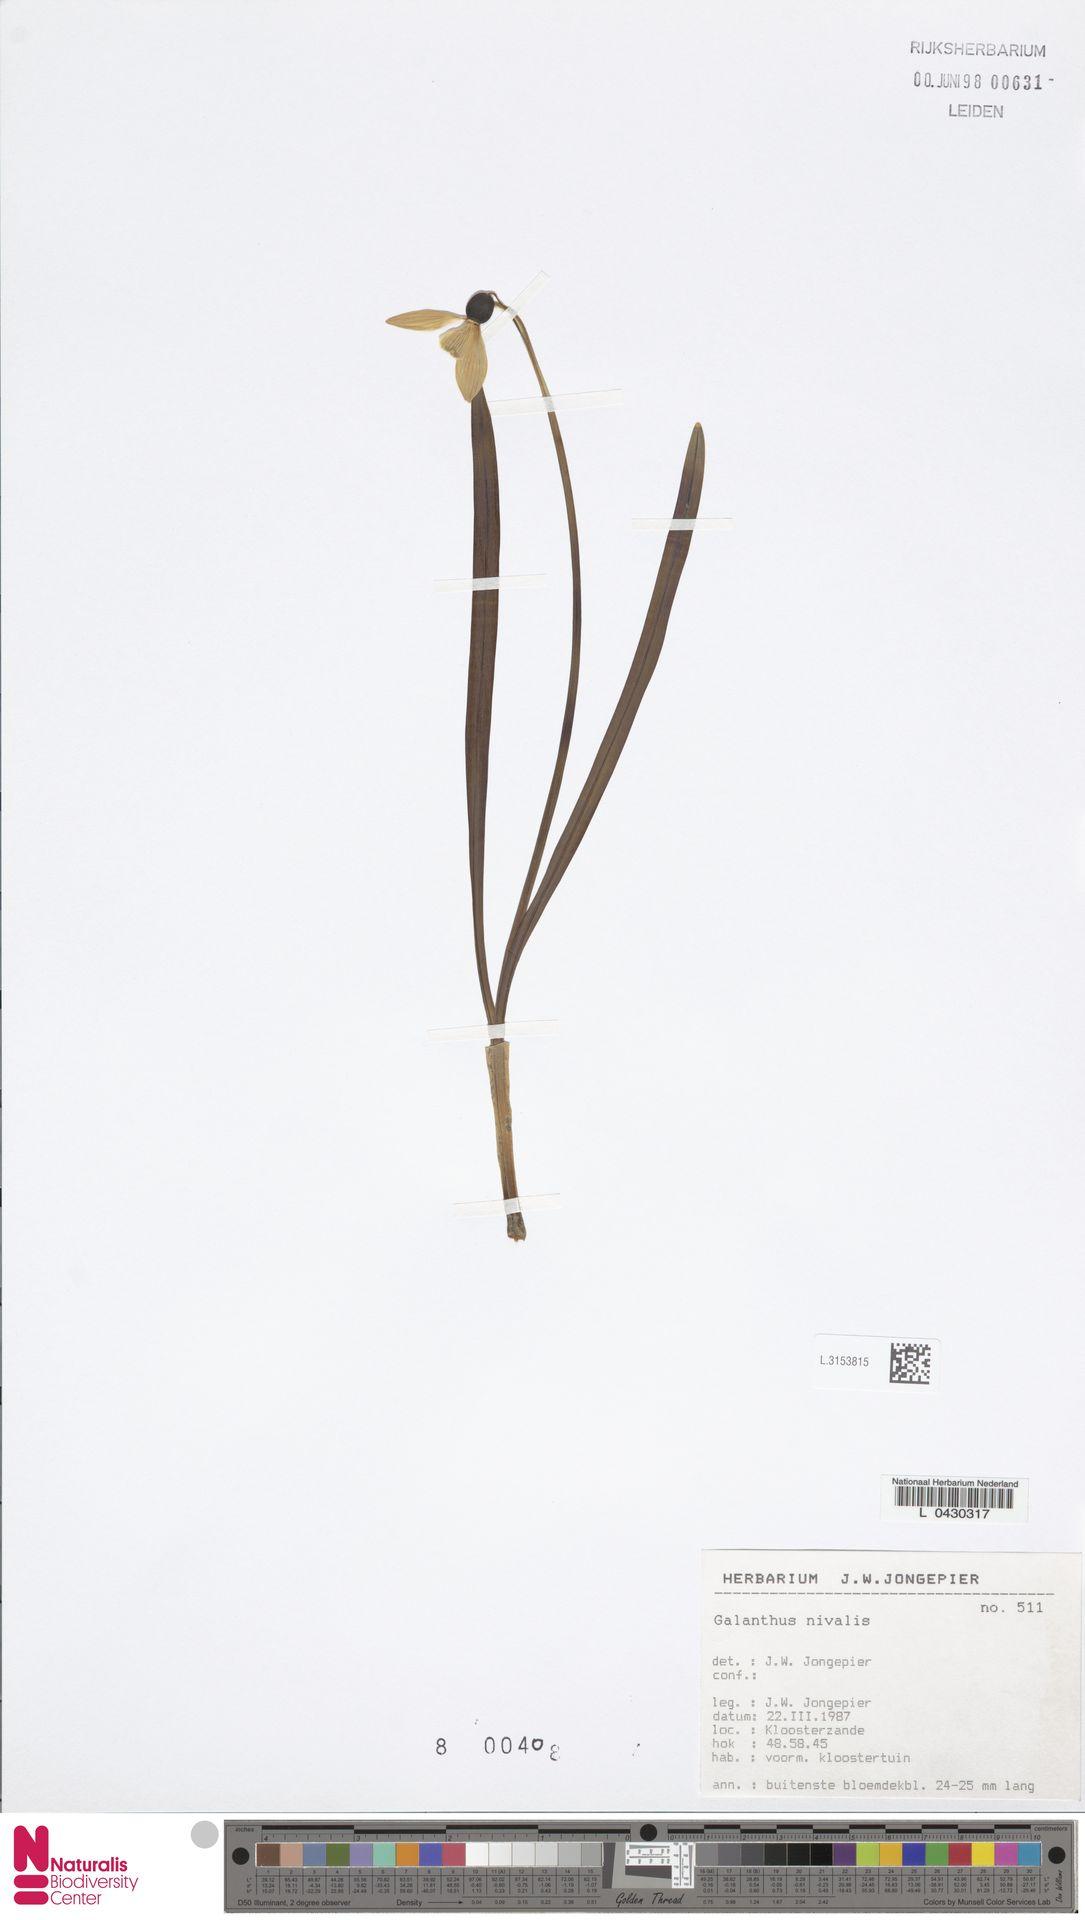 L.3153815 | Galanthus nivalis L.